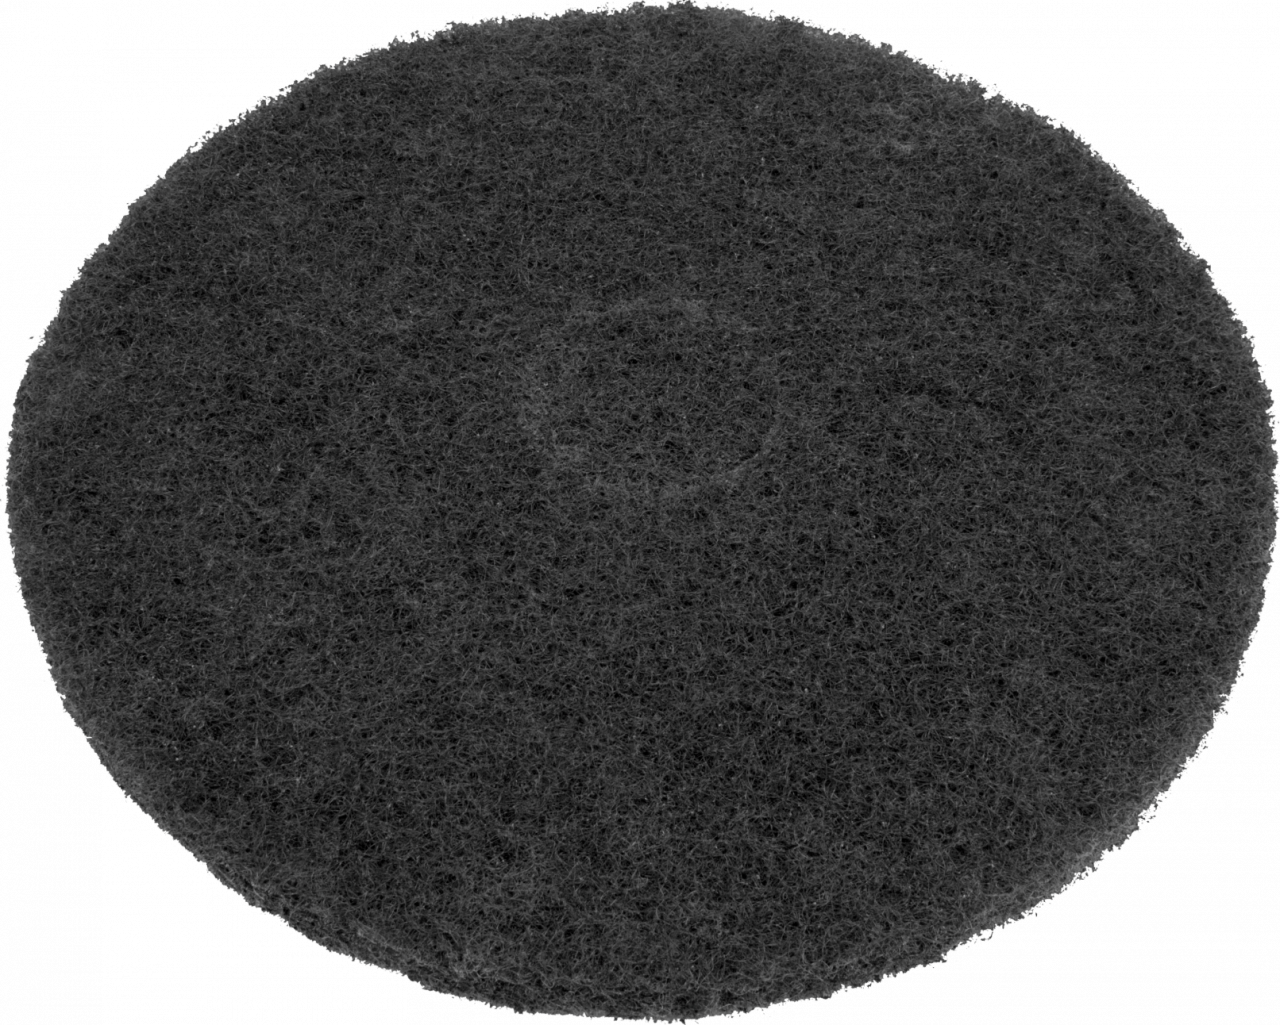 3M STRIPPING PADS - BLACK